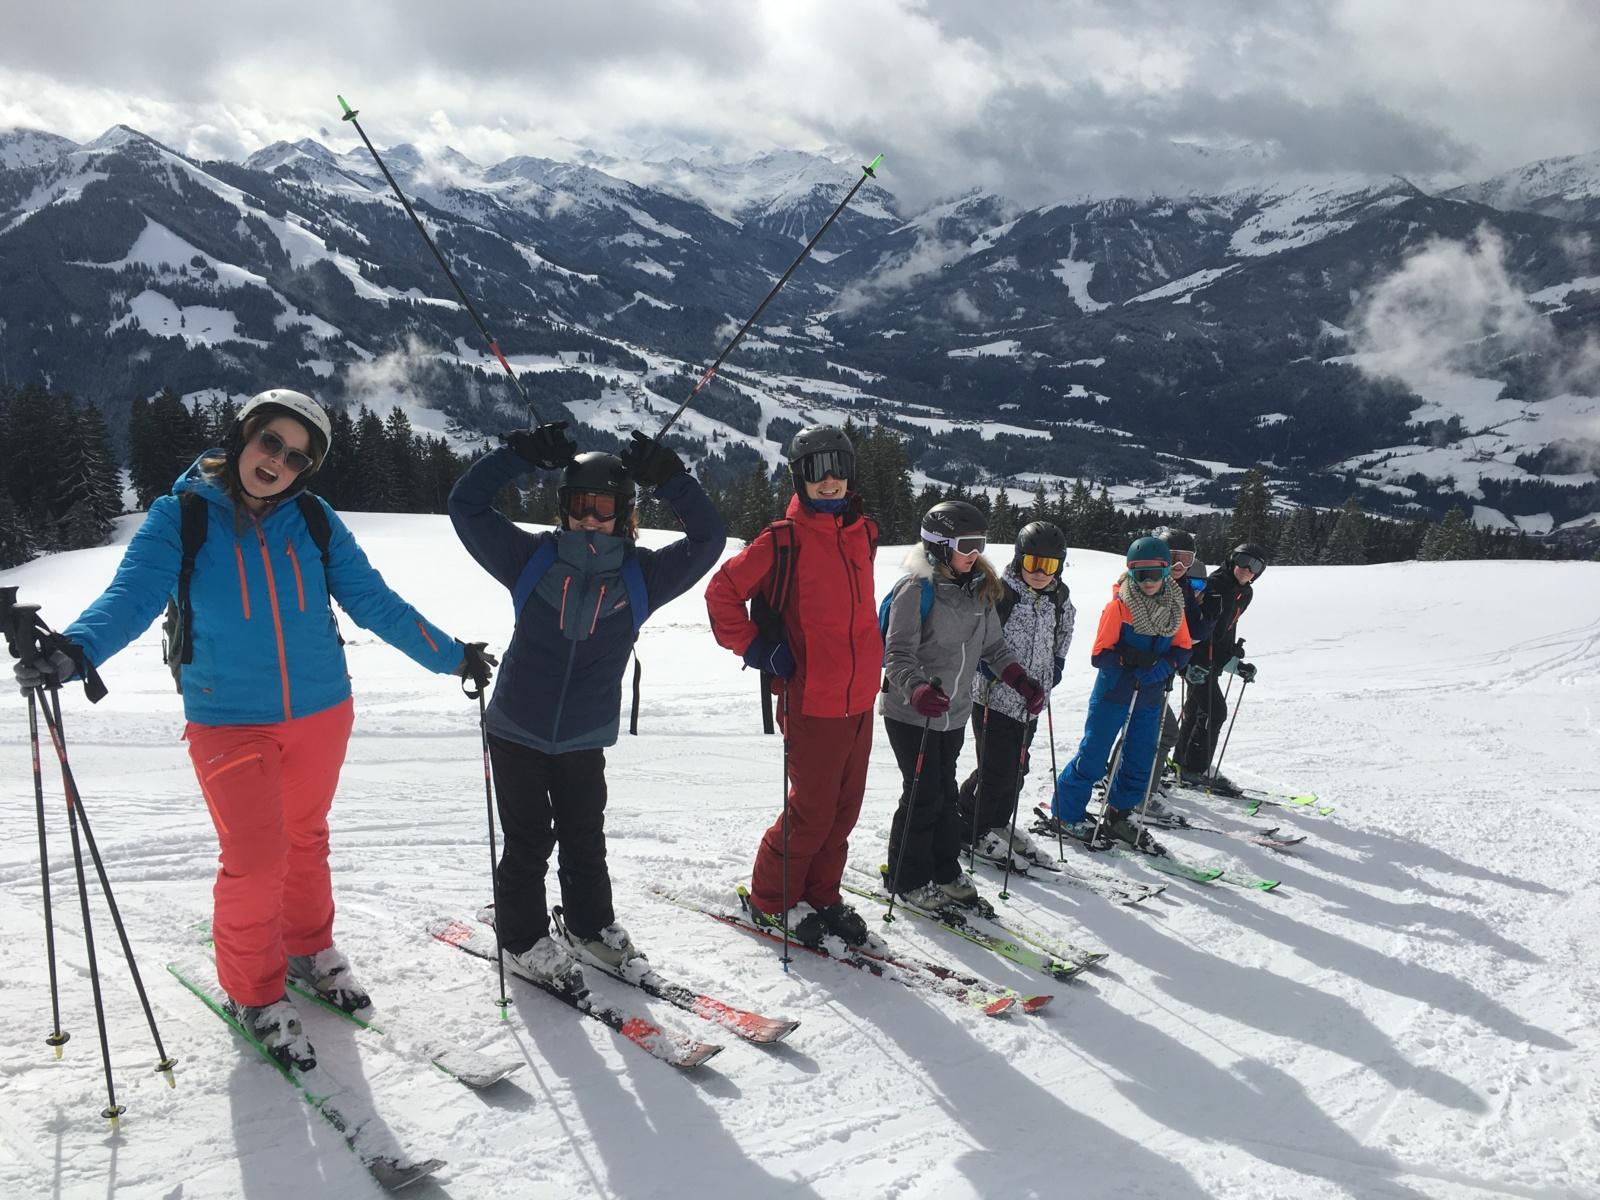 [2022] Skiwelt voor actieve skiërs - Krokus - Westendorf